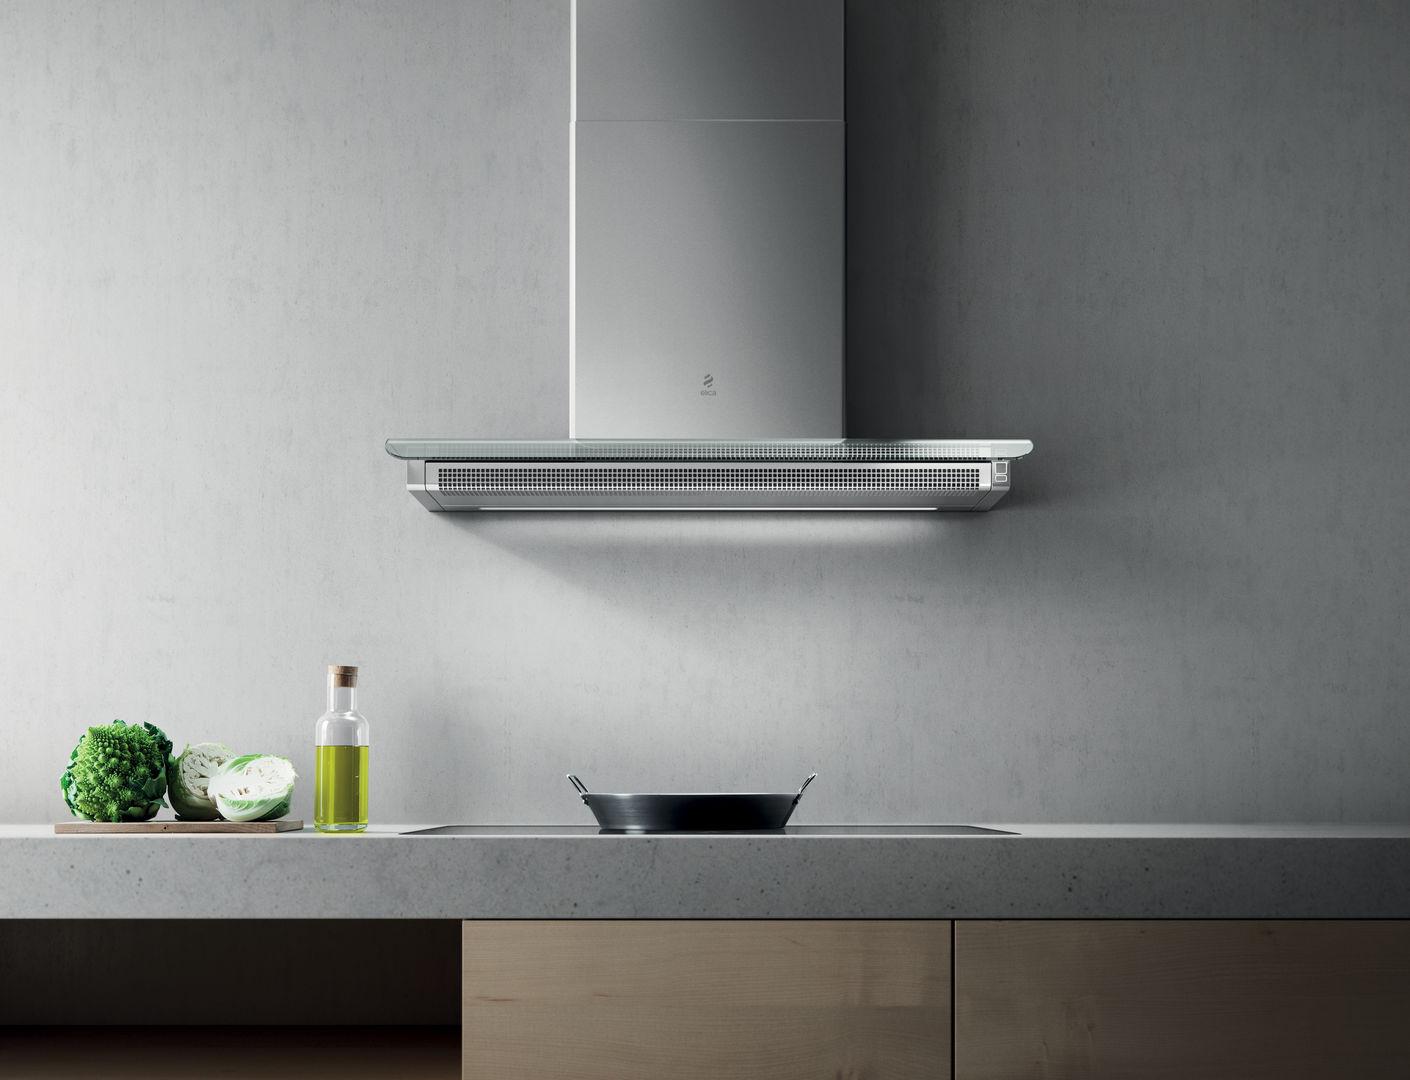 Elica Dunstabzugshaube Stripe Wandhaube 90 Cm Glas Weiß : Elica serendipity ix a dunstabzugshaube cm edelstahl glas